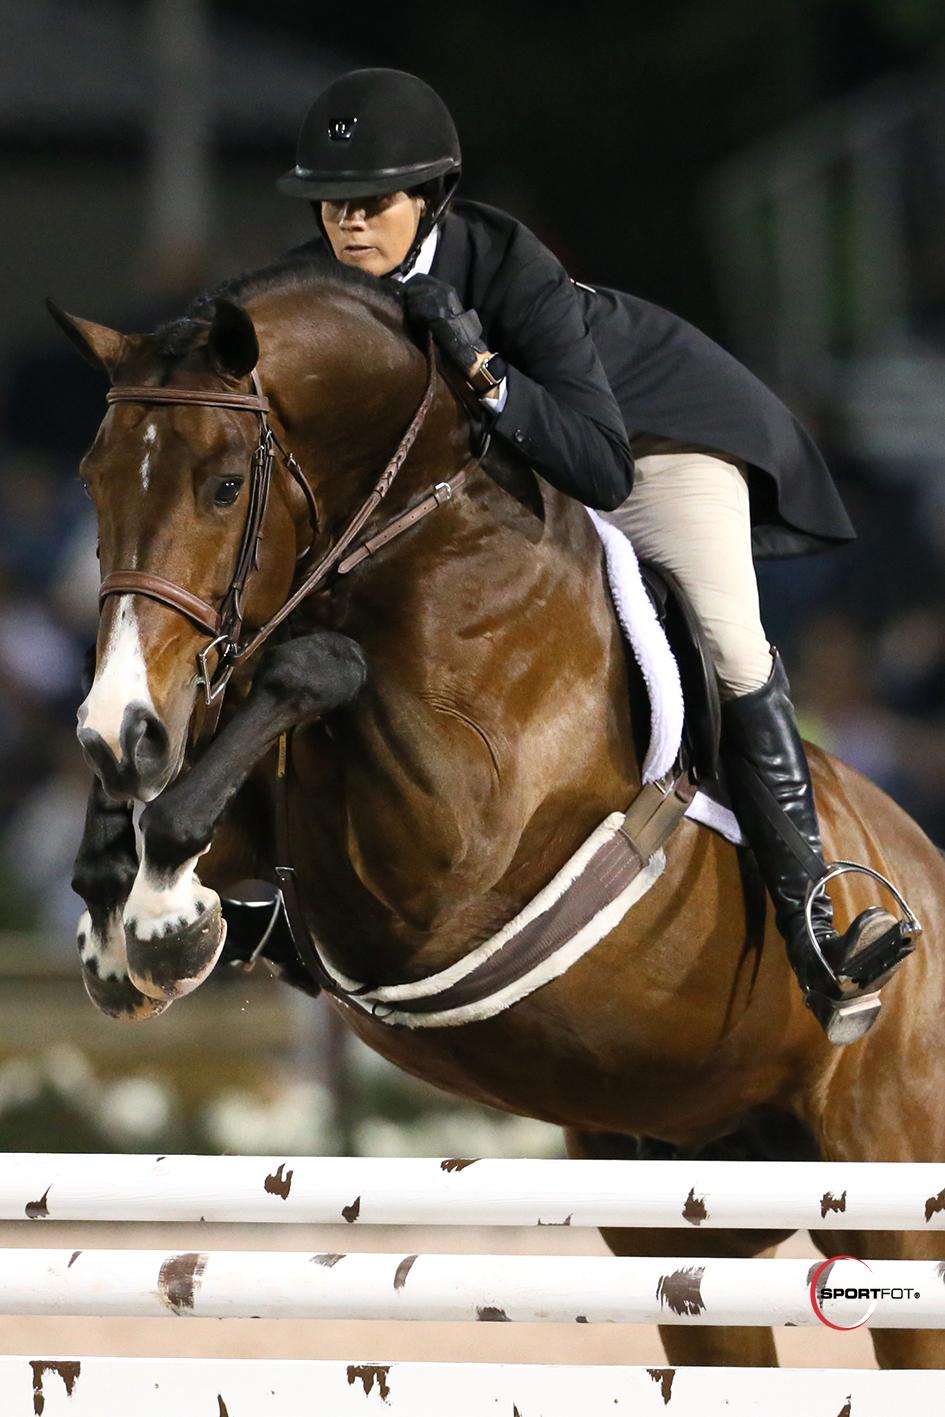 Amanda Steege and Lafitte de Muze WCHR 422_0523 Sportfot